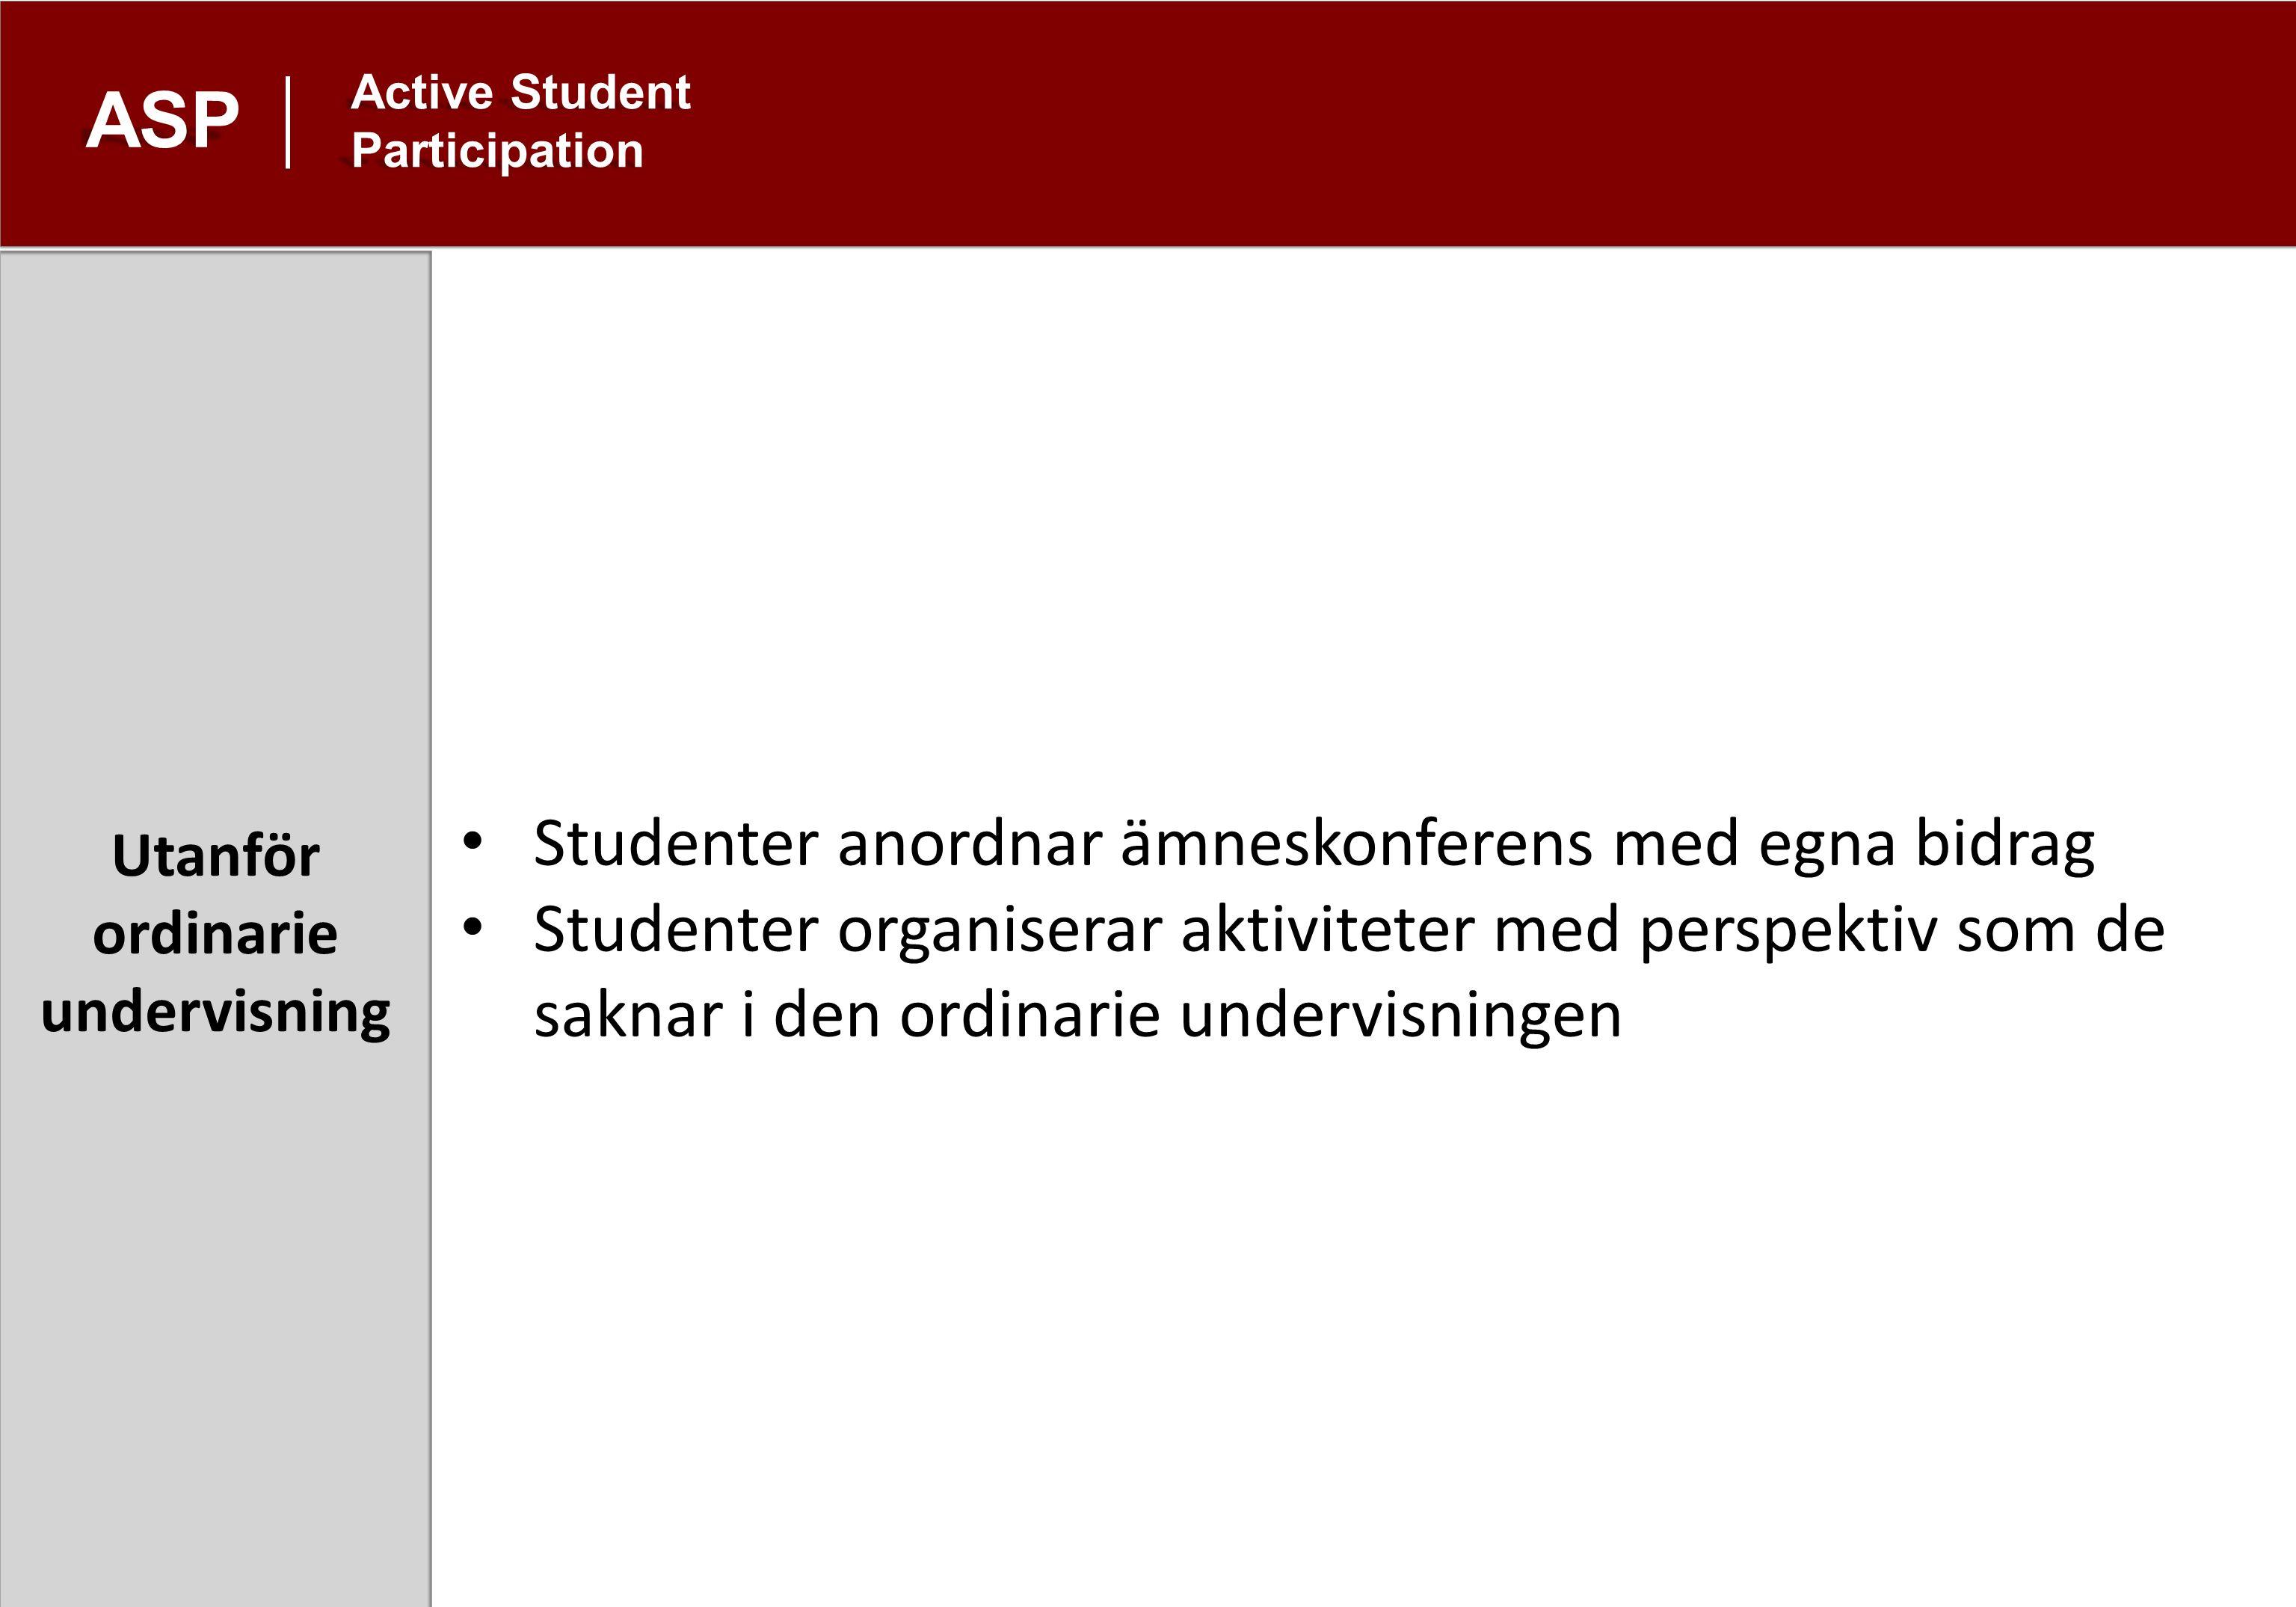 aktivstudentmedverkan@uadm.uu.se www.uu.se/asp Active Student Participation ASP Vilka ramar behövs?